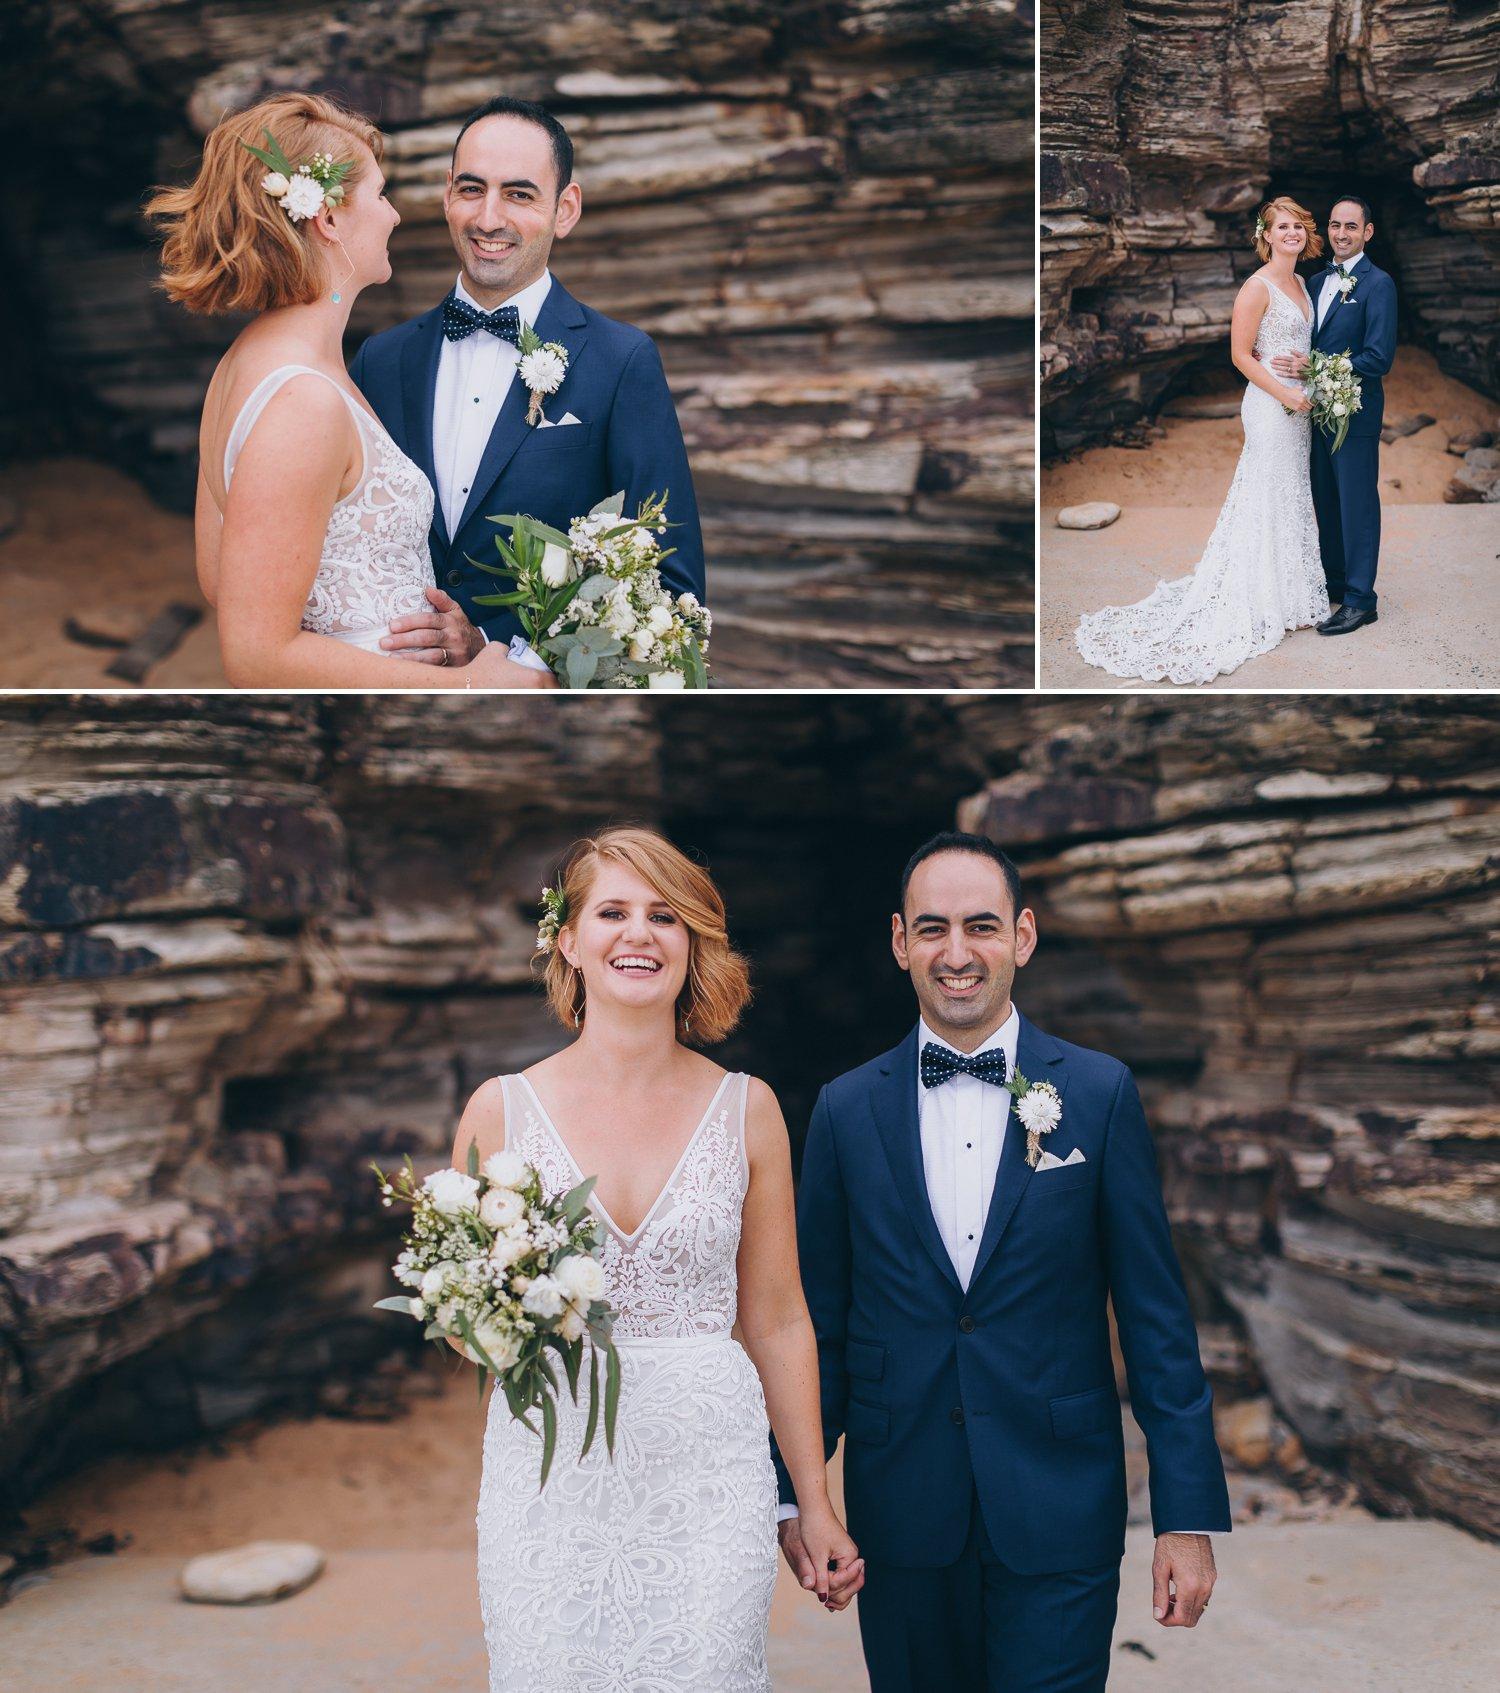 Rachel_Toby_Mr_Mrs_Wedding_Avalon_Beach_Cloud9Events.jpg